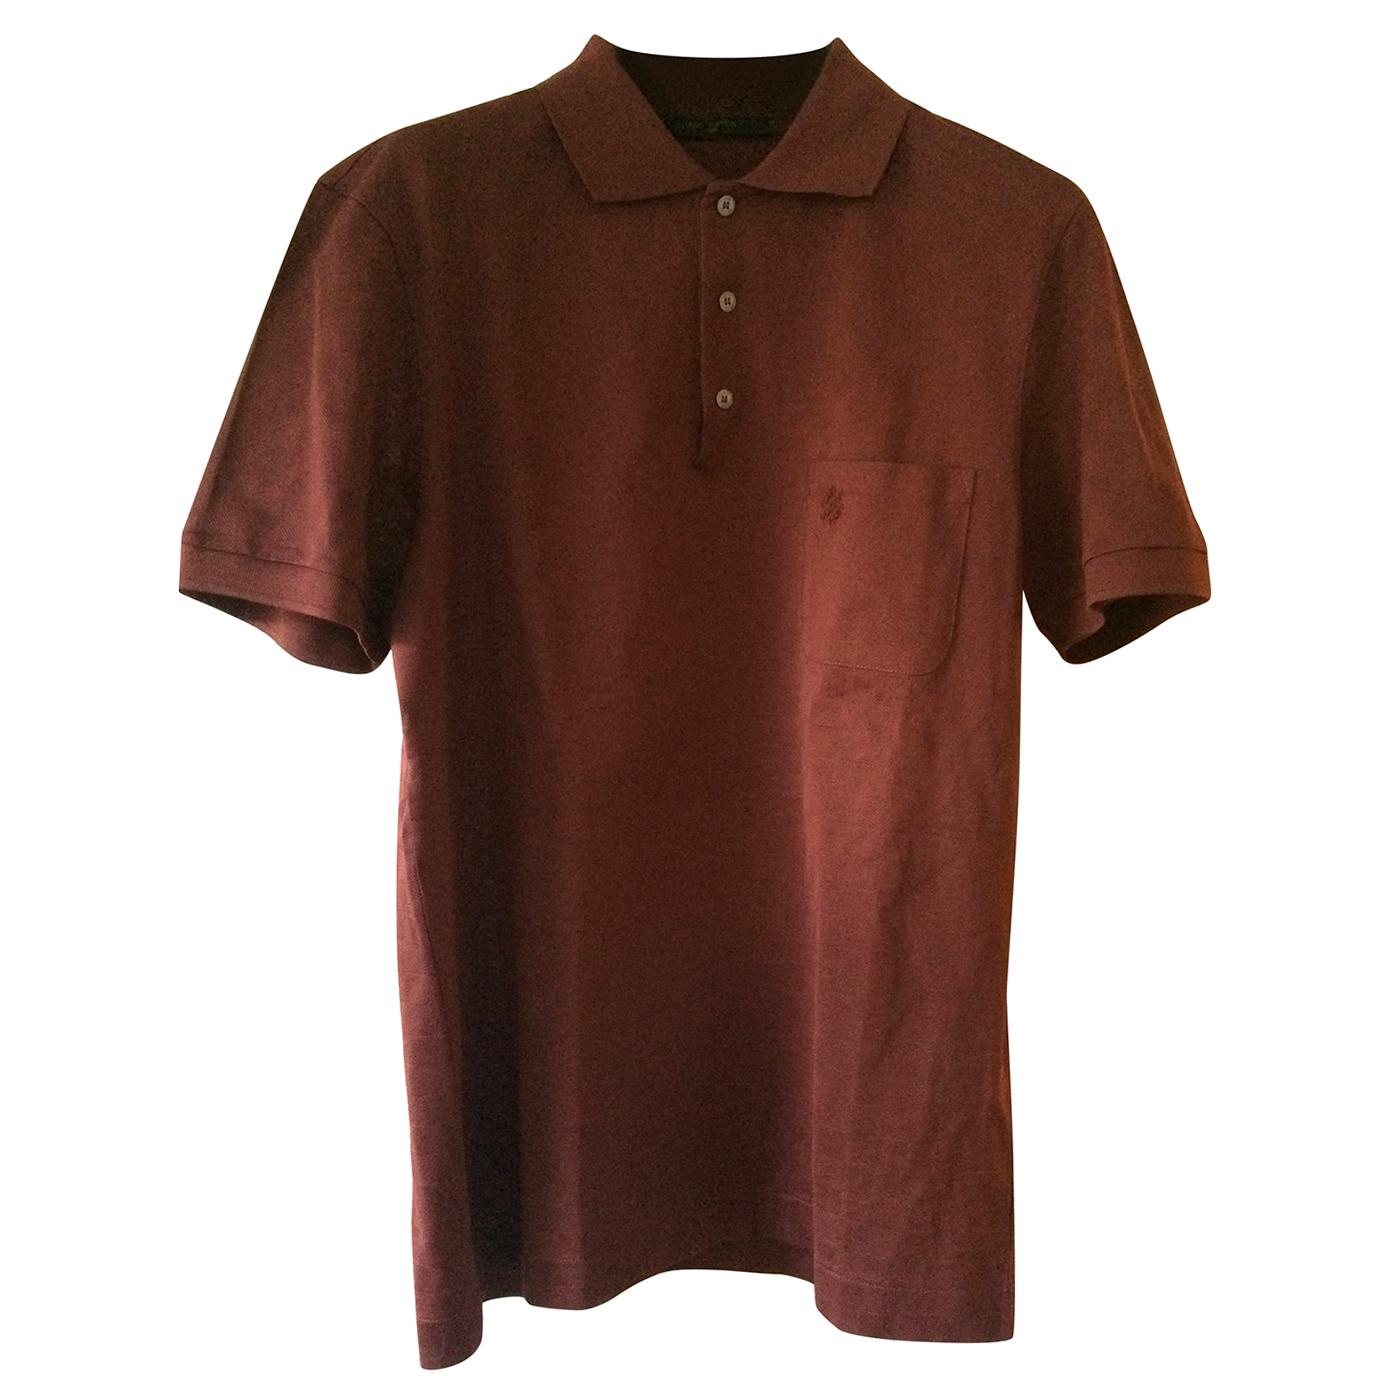 Louis Vuitton Mens Shirts Polo